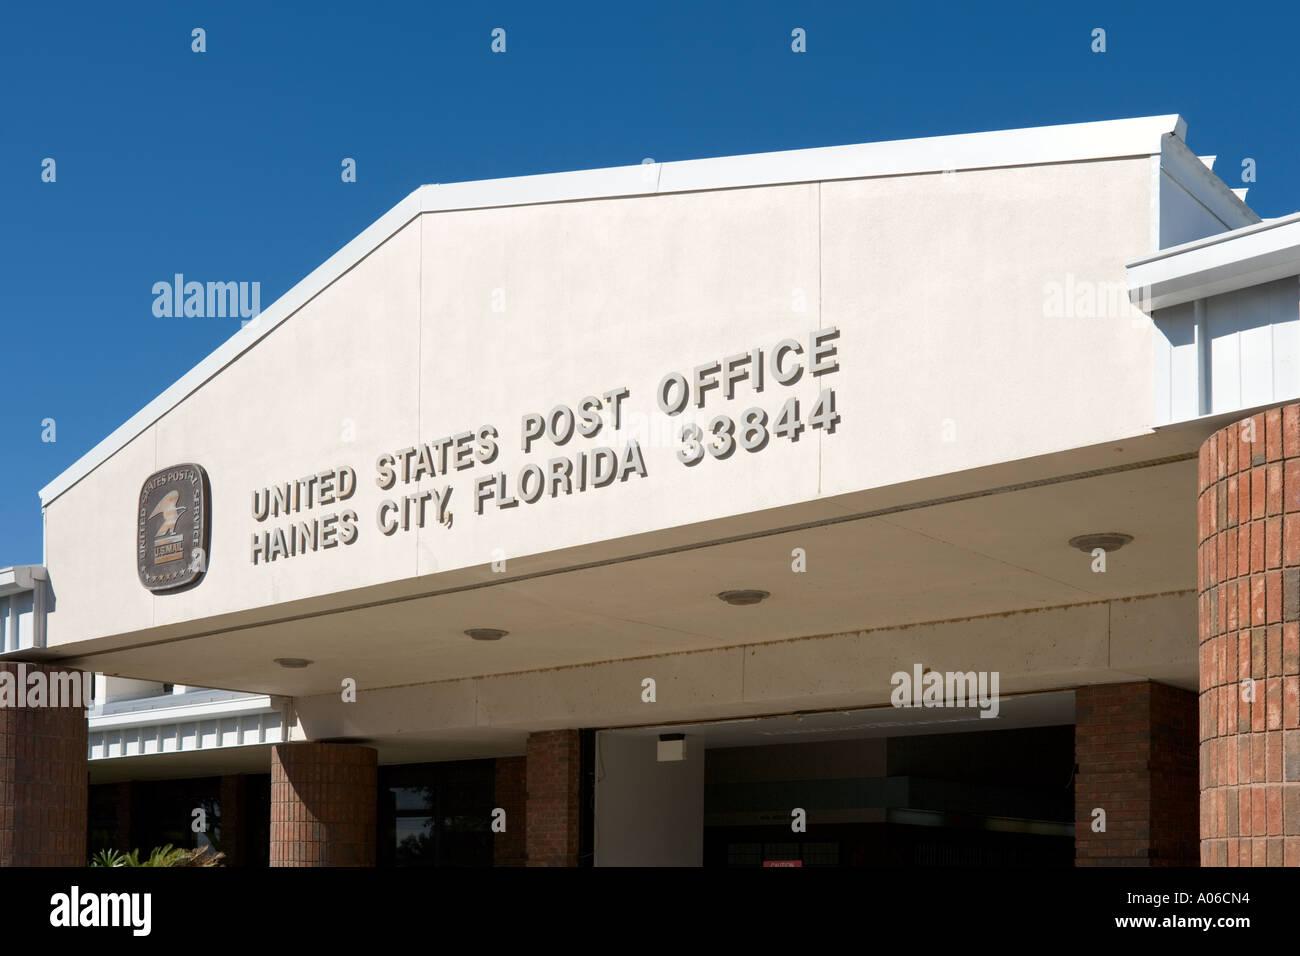 Entrance to Post Office, Unites States Postal Service, Haines City, Florida, USA Stock Photo